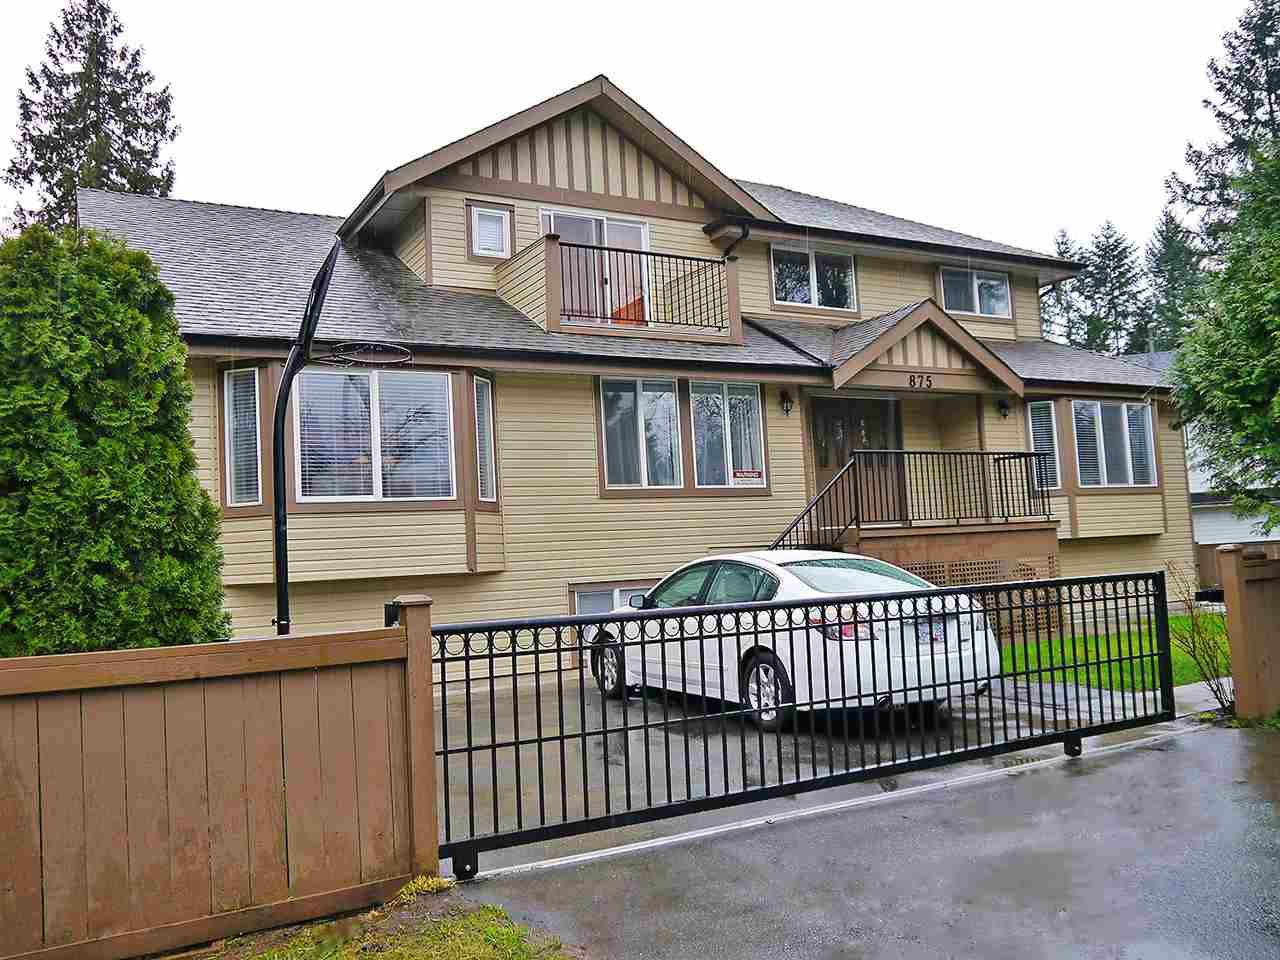 Main Photo: 875 GREENE STREET in : Meadow Brook House for sale : MLS®# R2039636